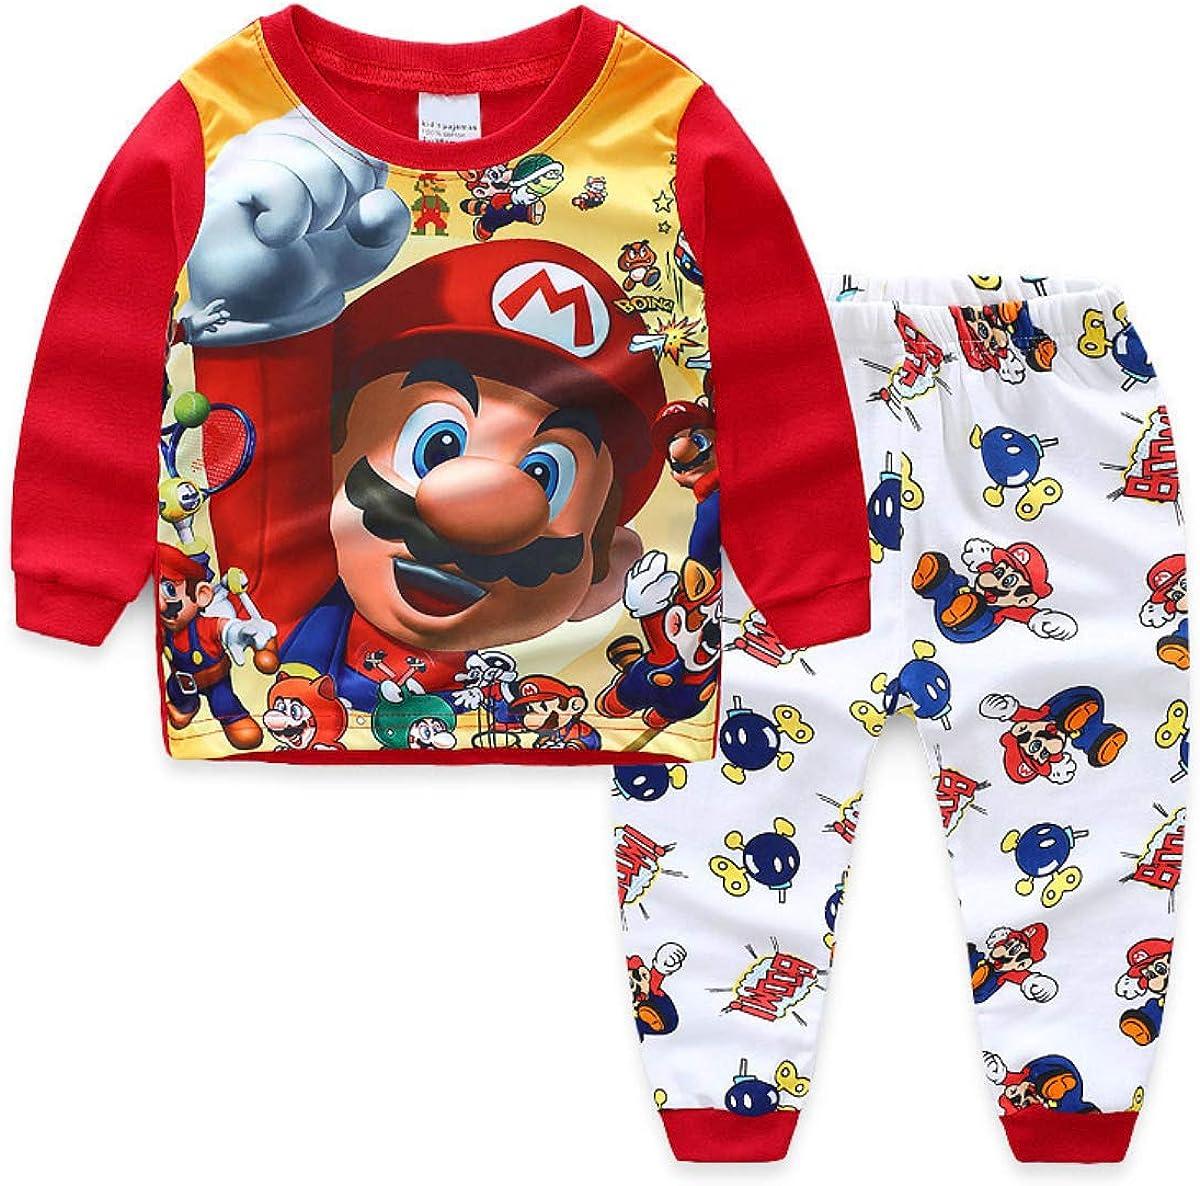 Discount is also underway San Francisco Mall Foryo Boys Super Hero Pajamas Set 100% Cot Kids Nightwear Summer